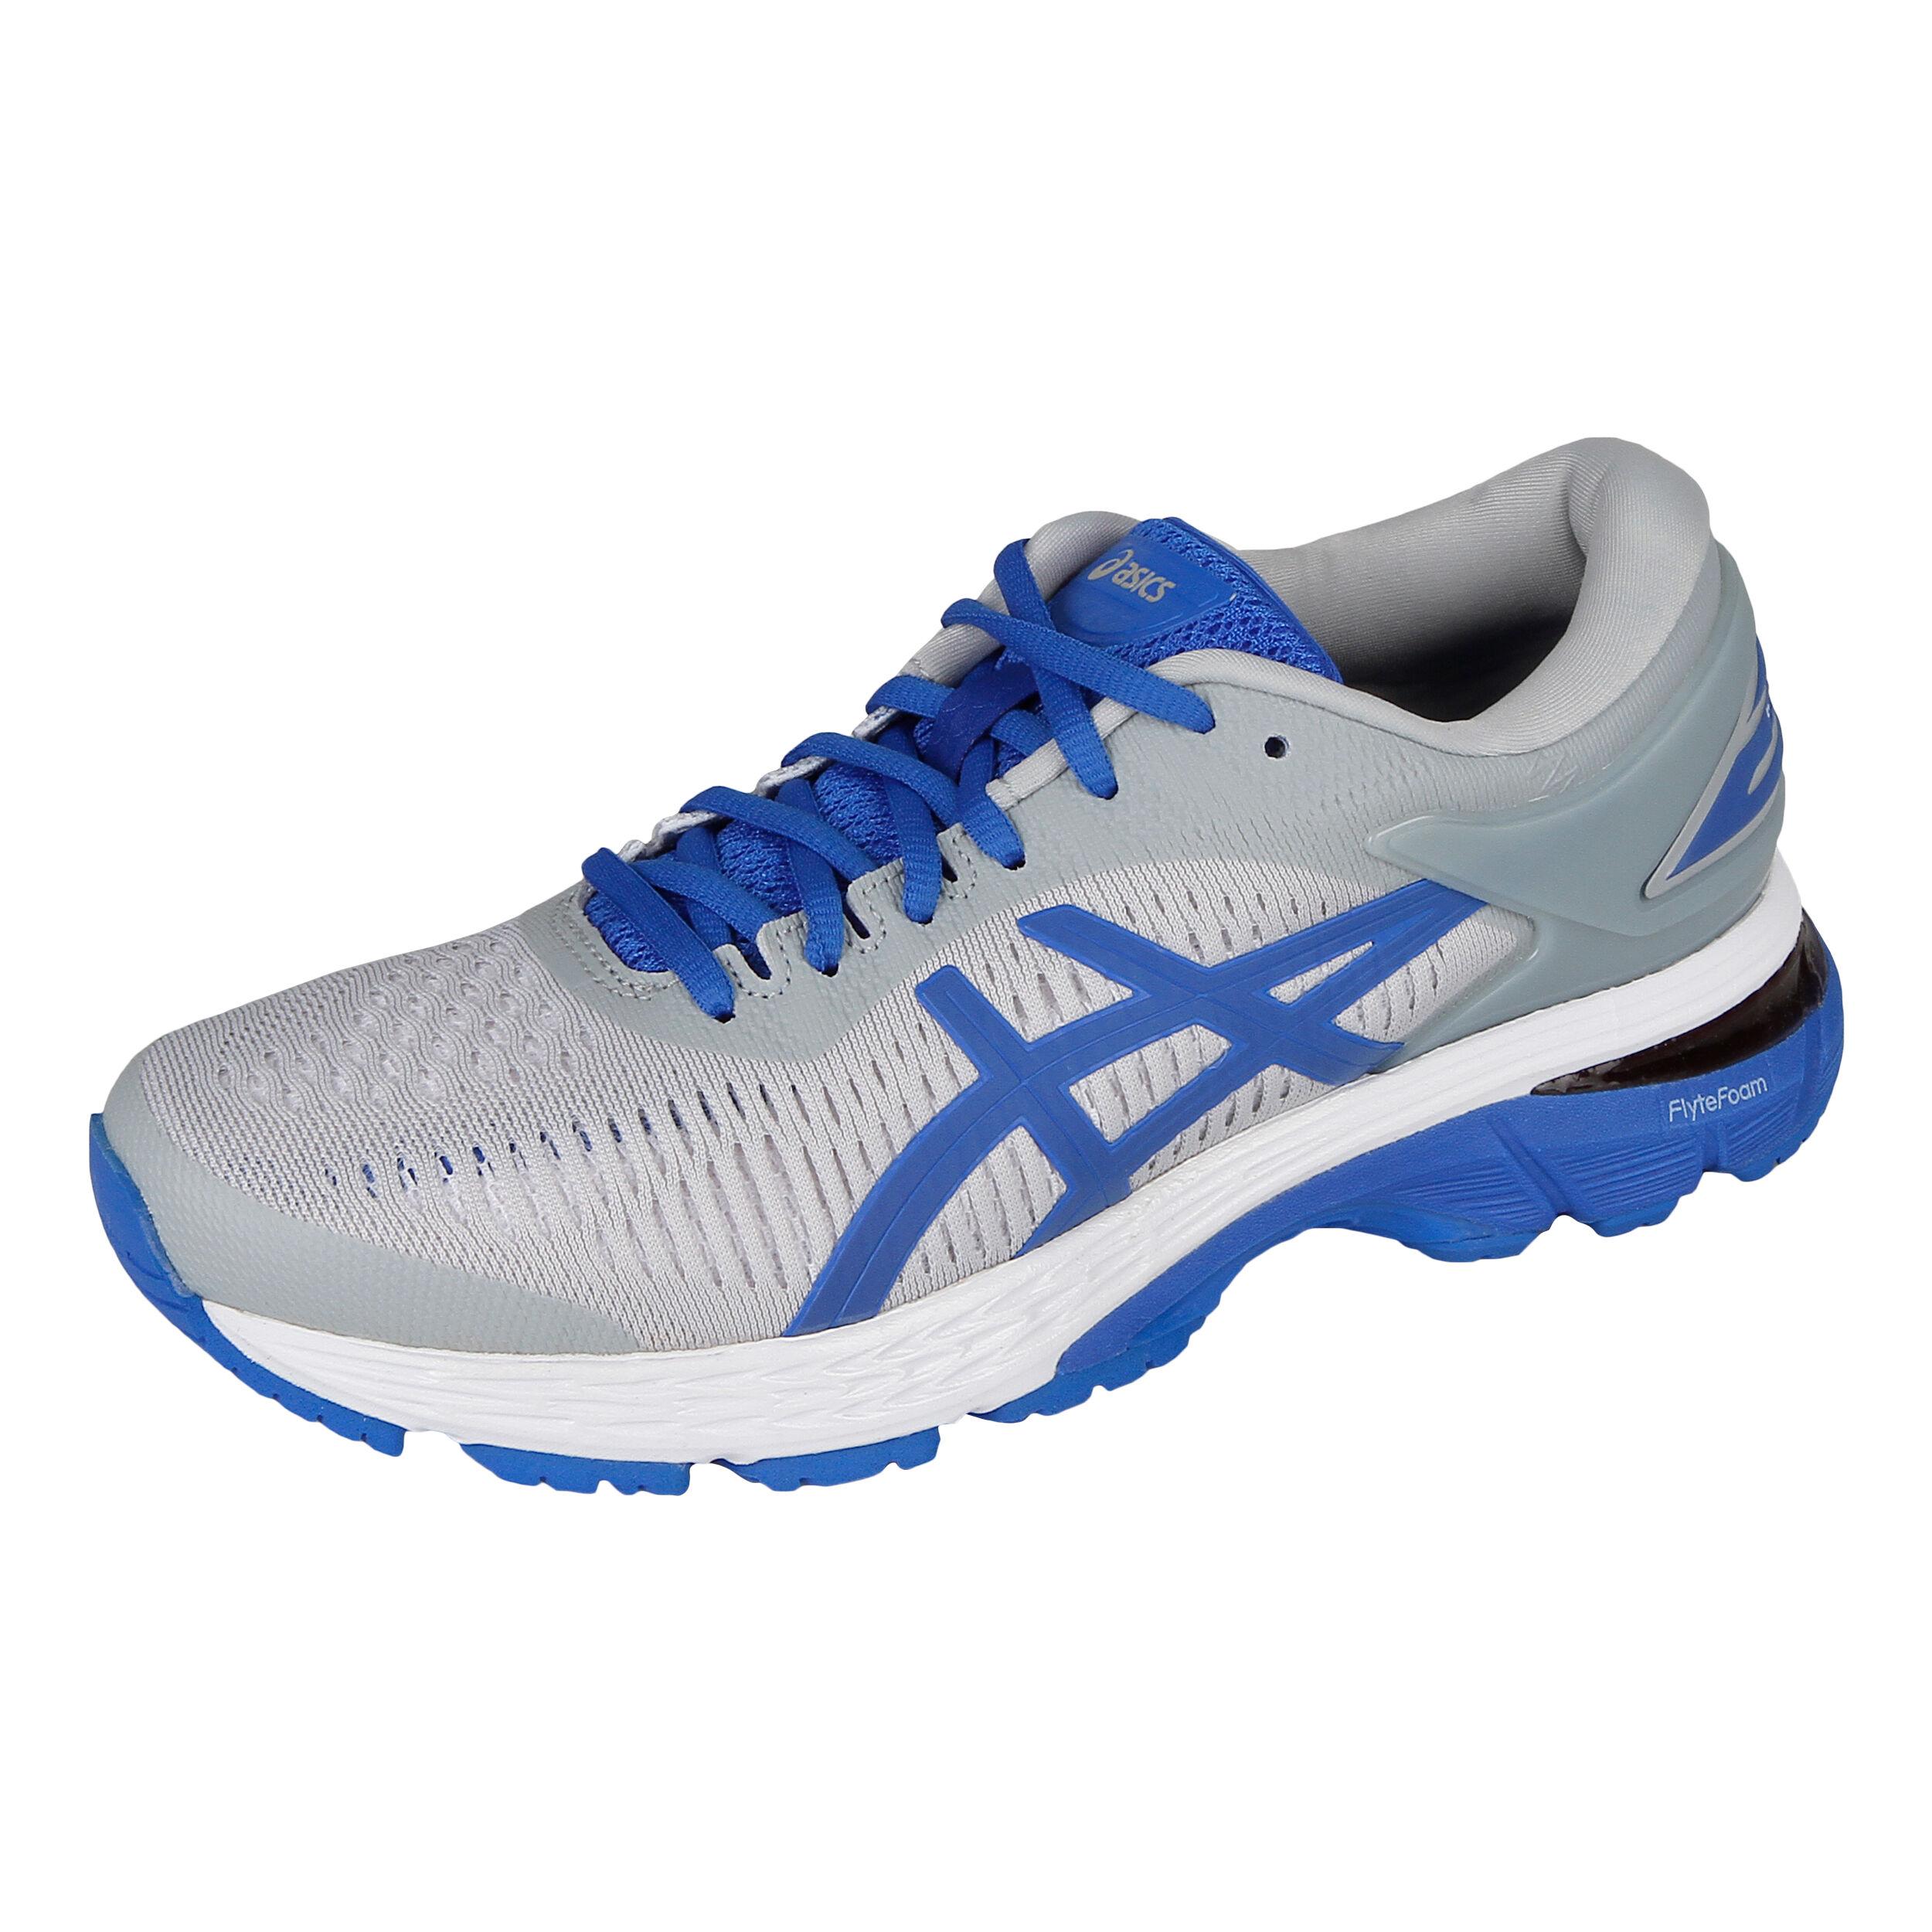 buy Asics Gel-Kayano 25 Lite-Show Stability Running Shoe ...